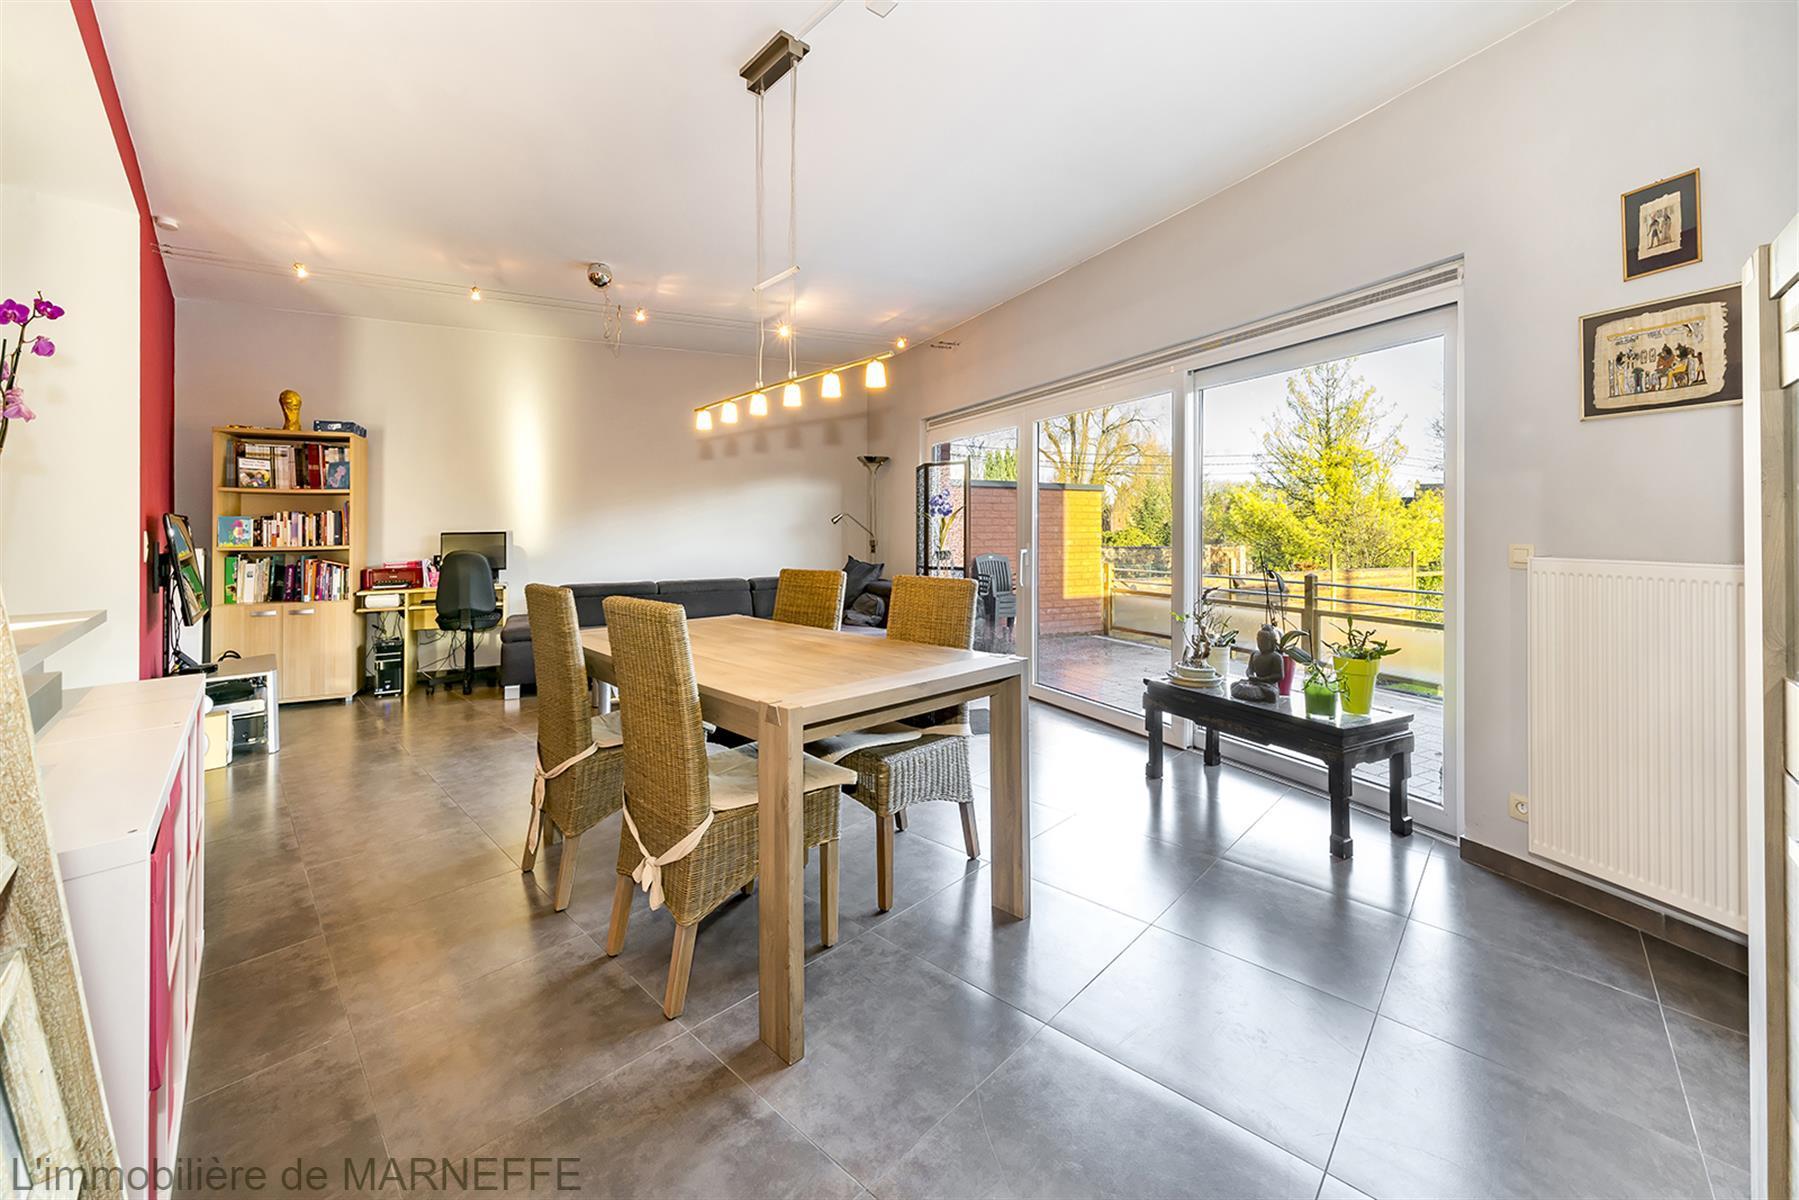 Appartement avec jardin - Orp-Jauche - #3625402-2